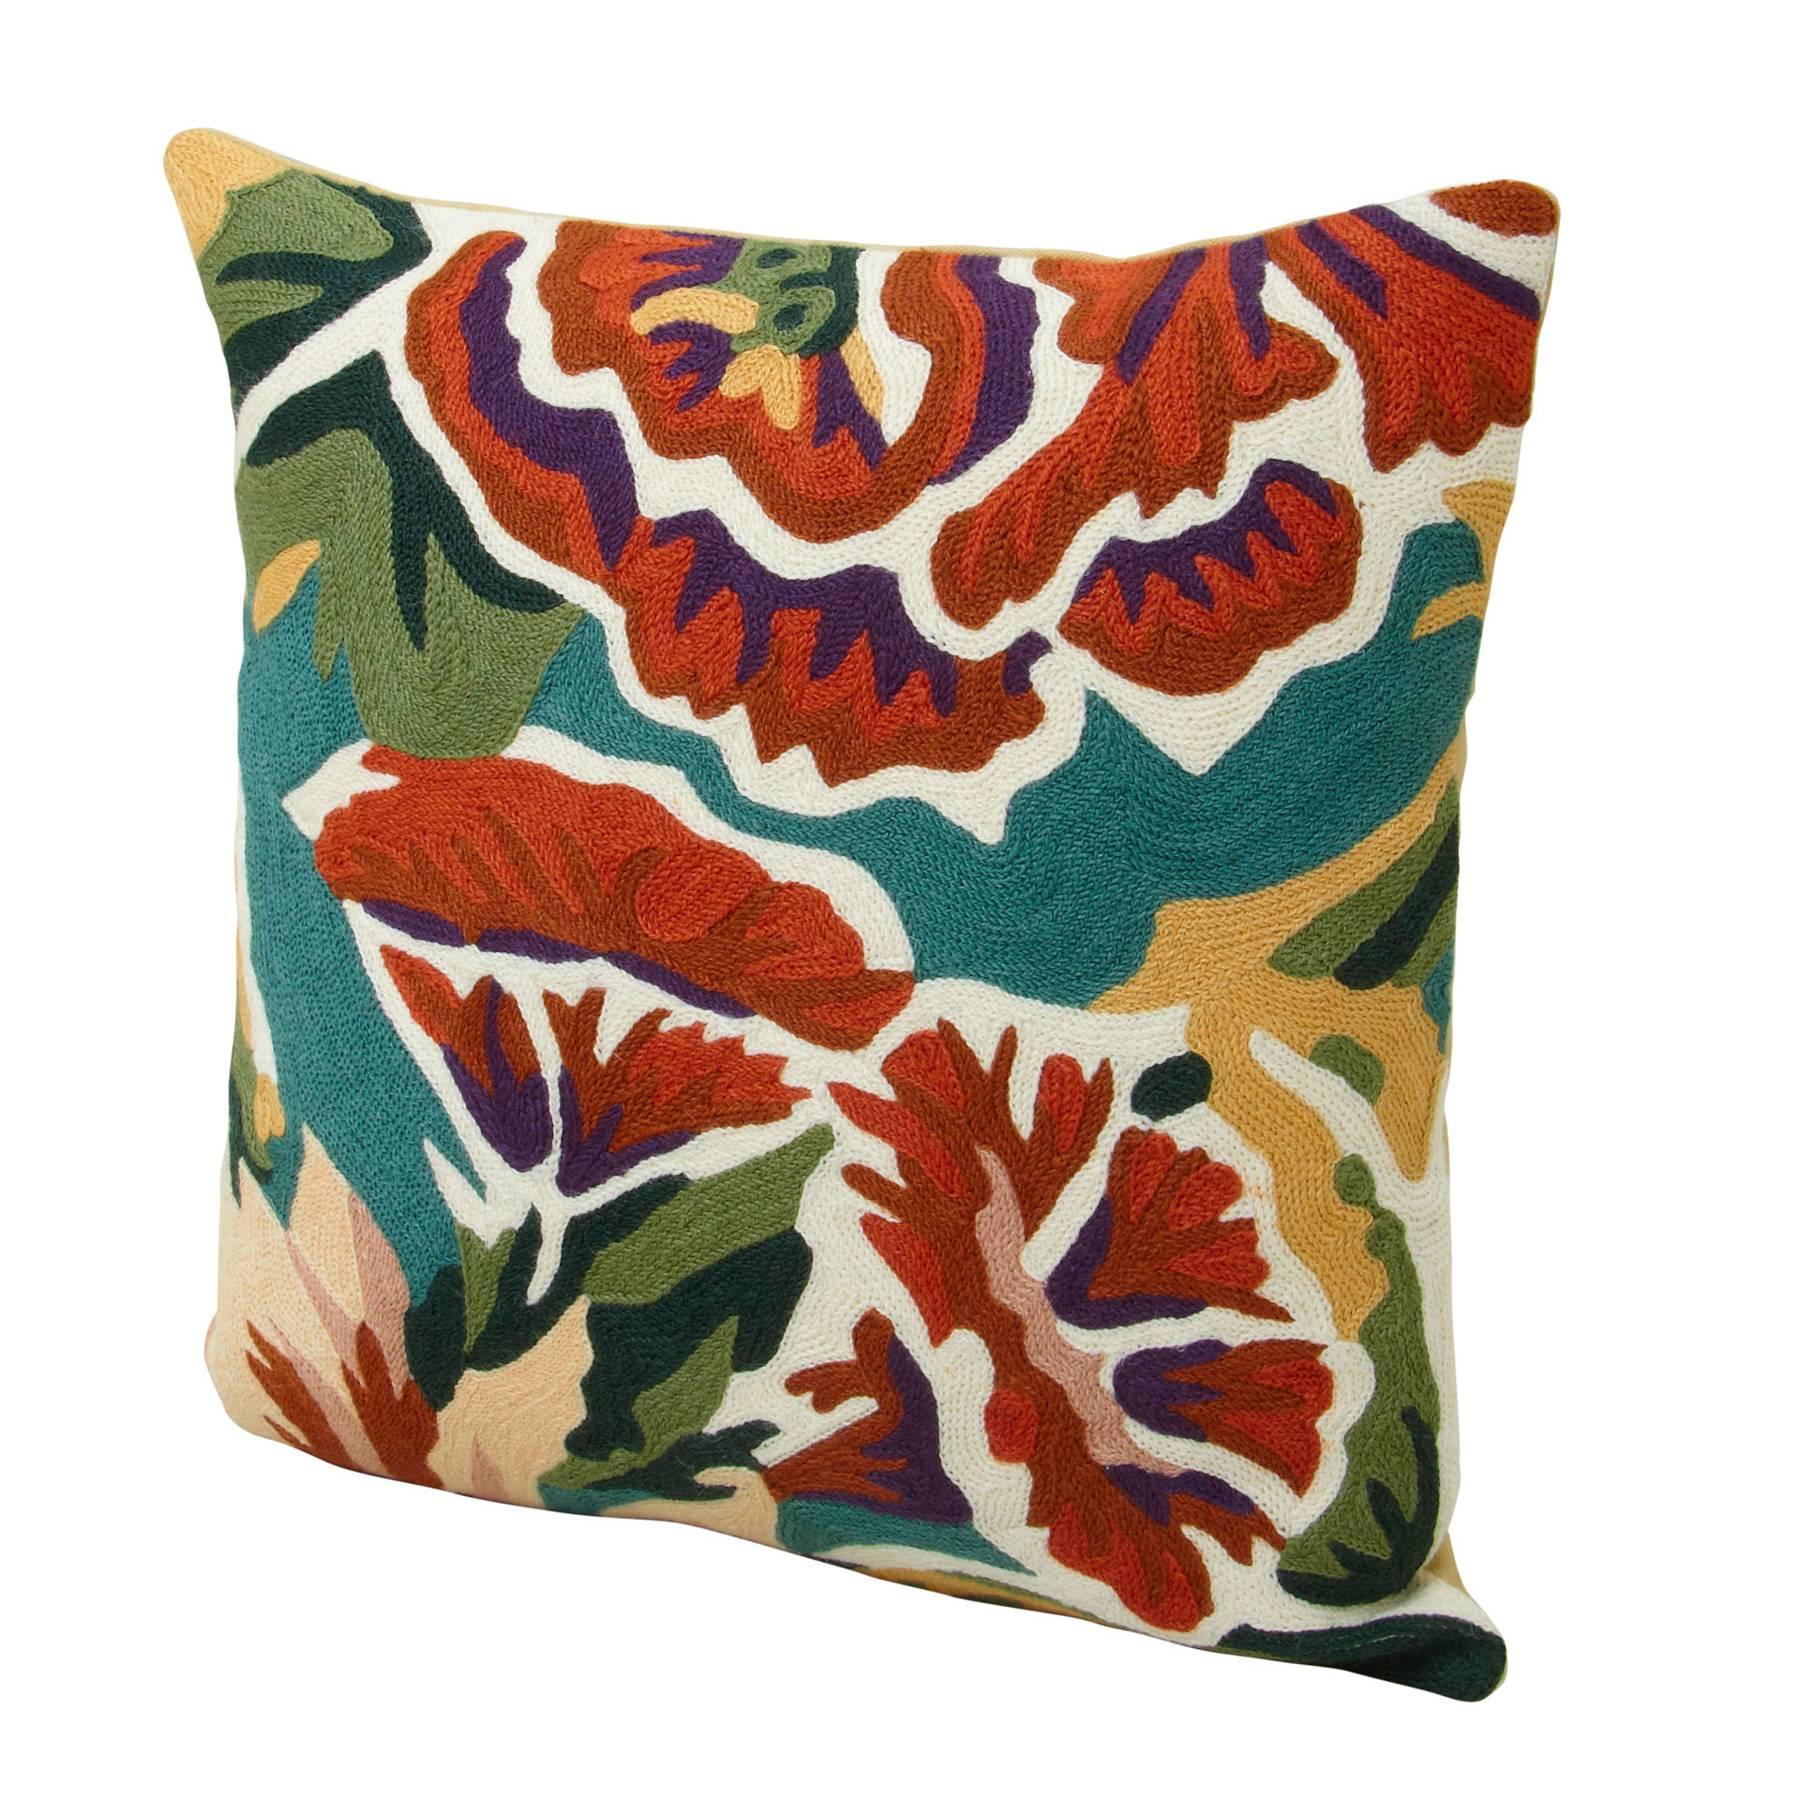 39116187b59b0f Best Cushions – Interior Design Ideas & Inspiration | House & Garden